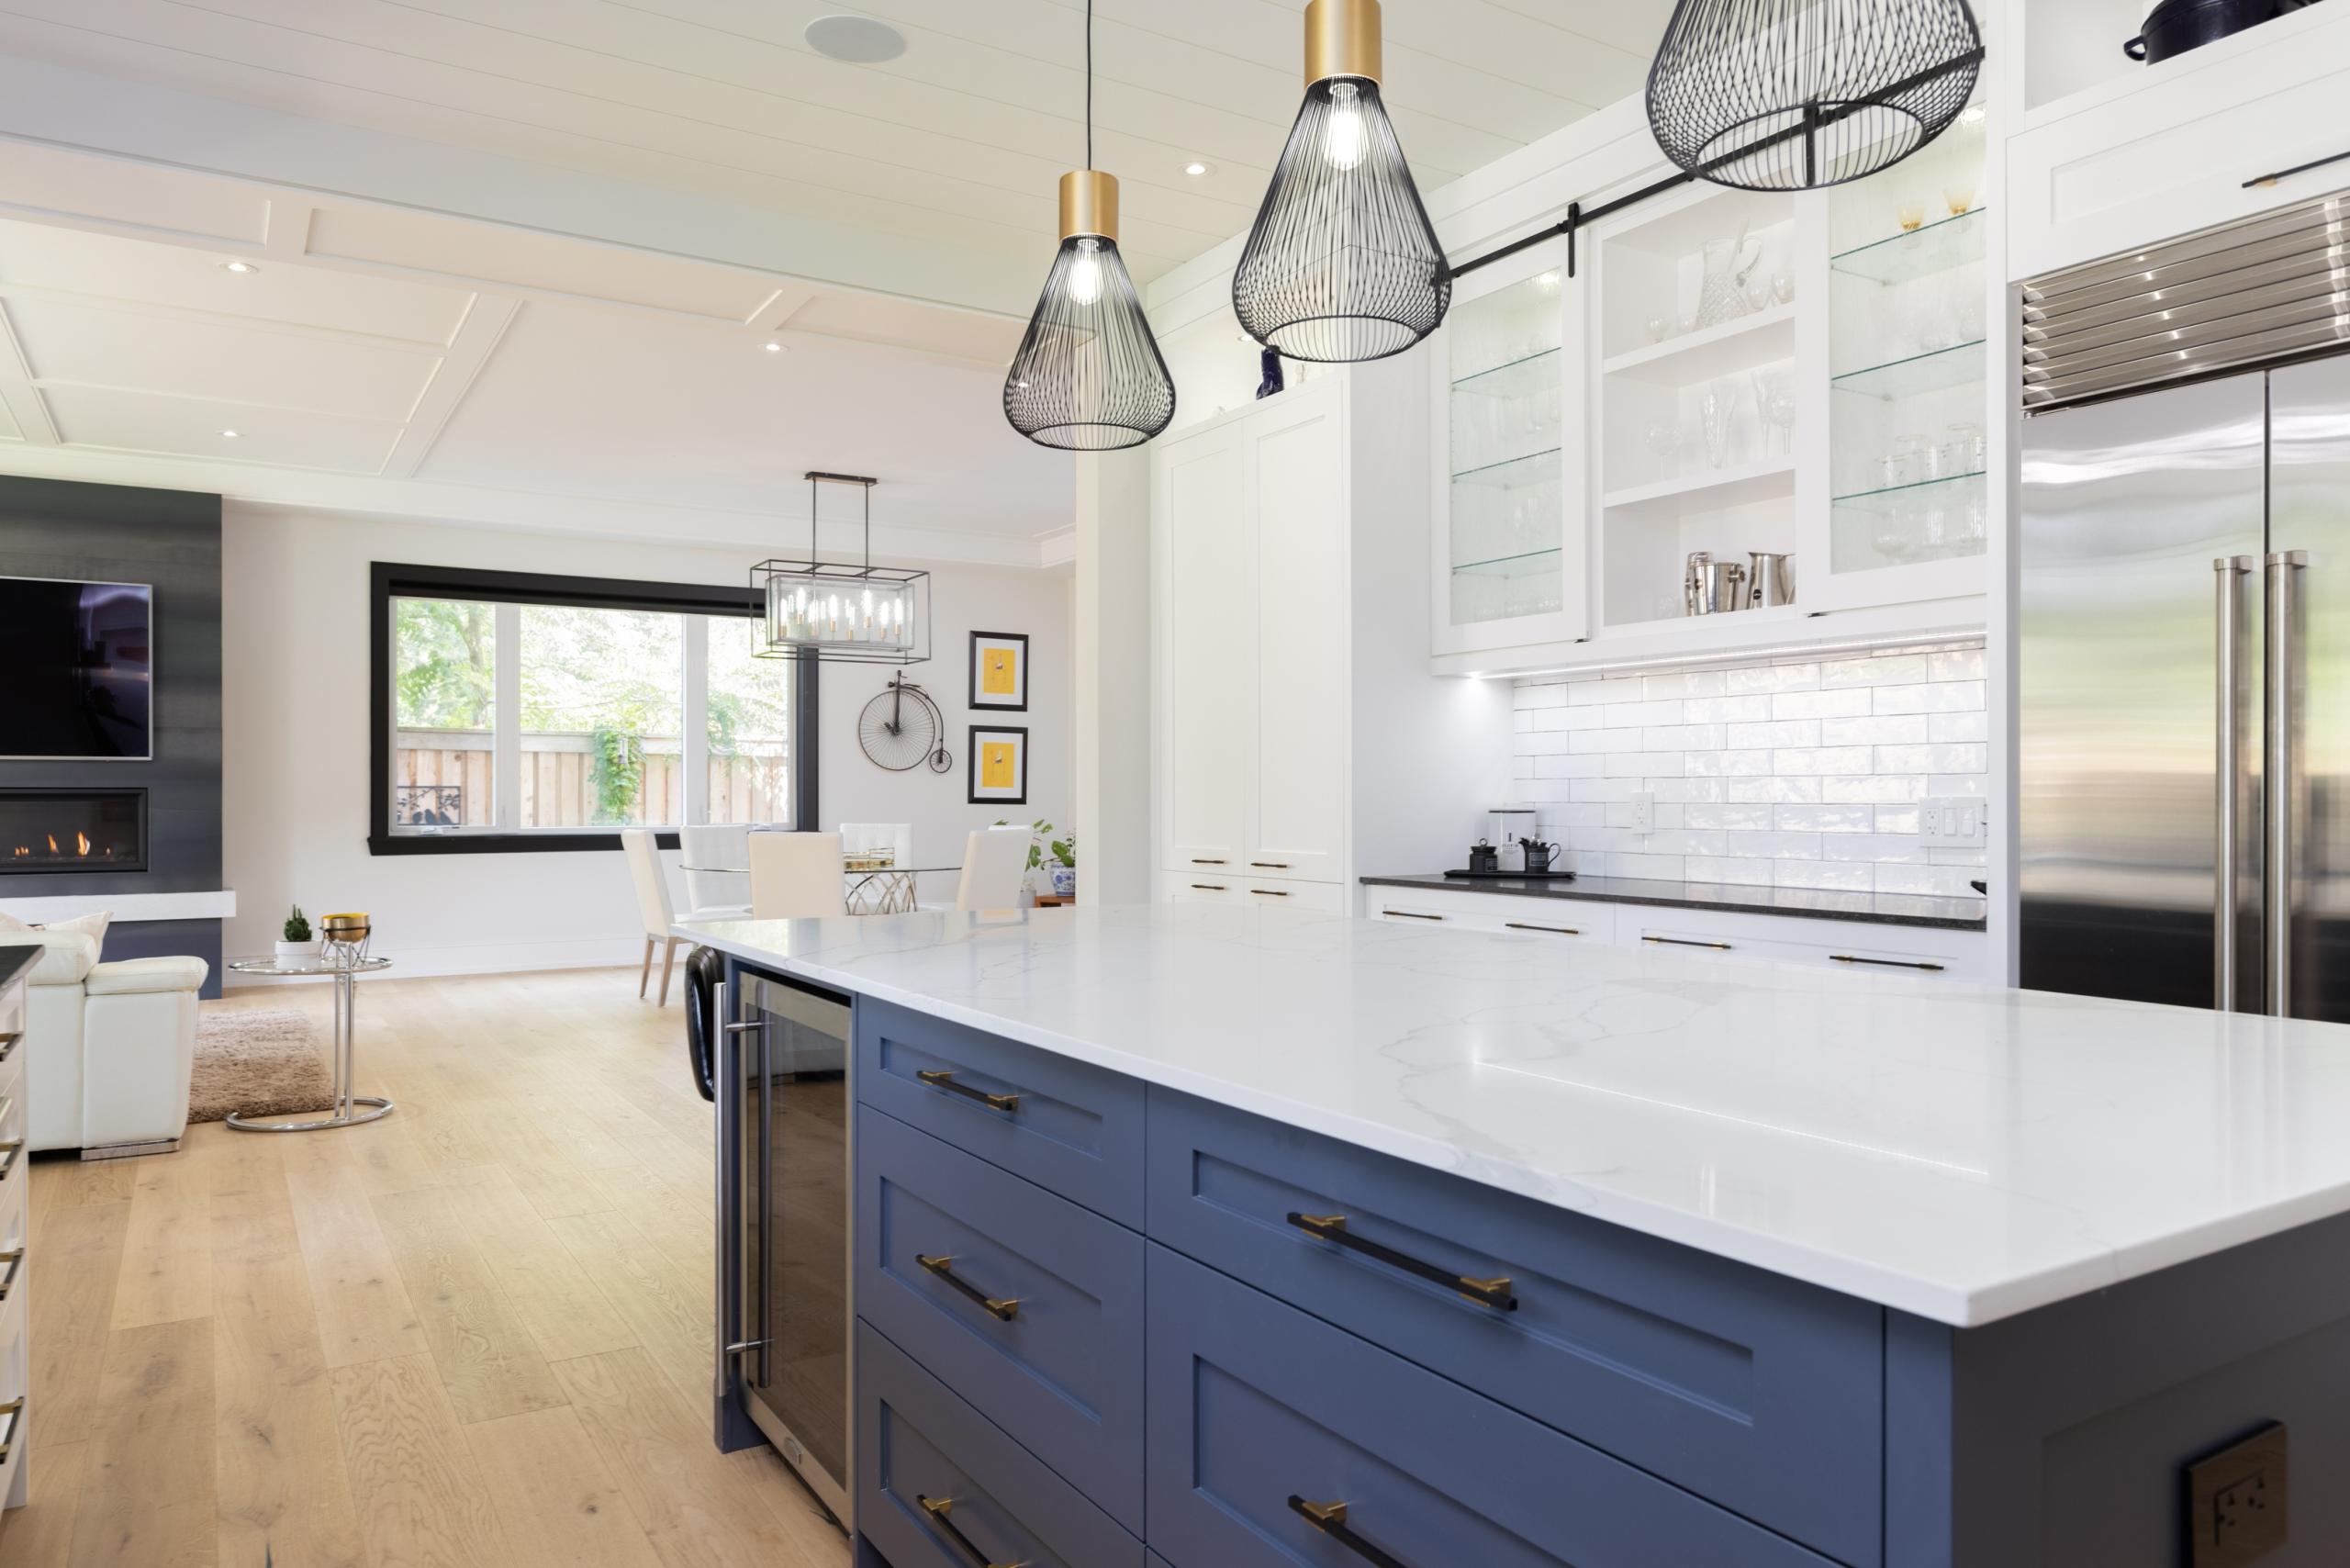 Kitchen featured at 489 Lakeshore Road W, Oakville at Alex Irish & Associates